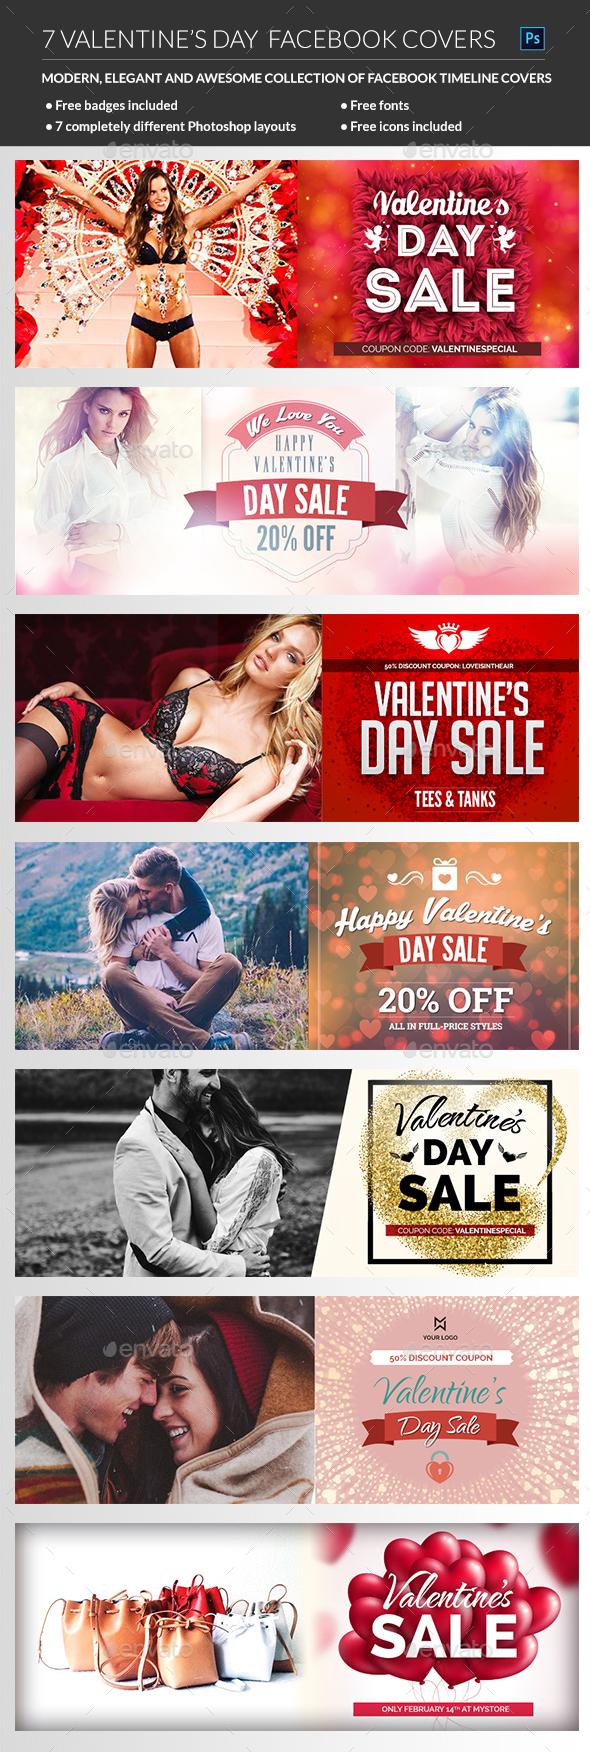 Valentines Facebook Cover - Facebook Timeline Covers Social Media